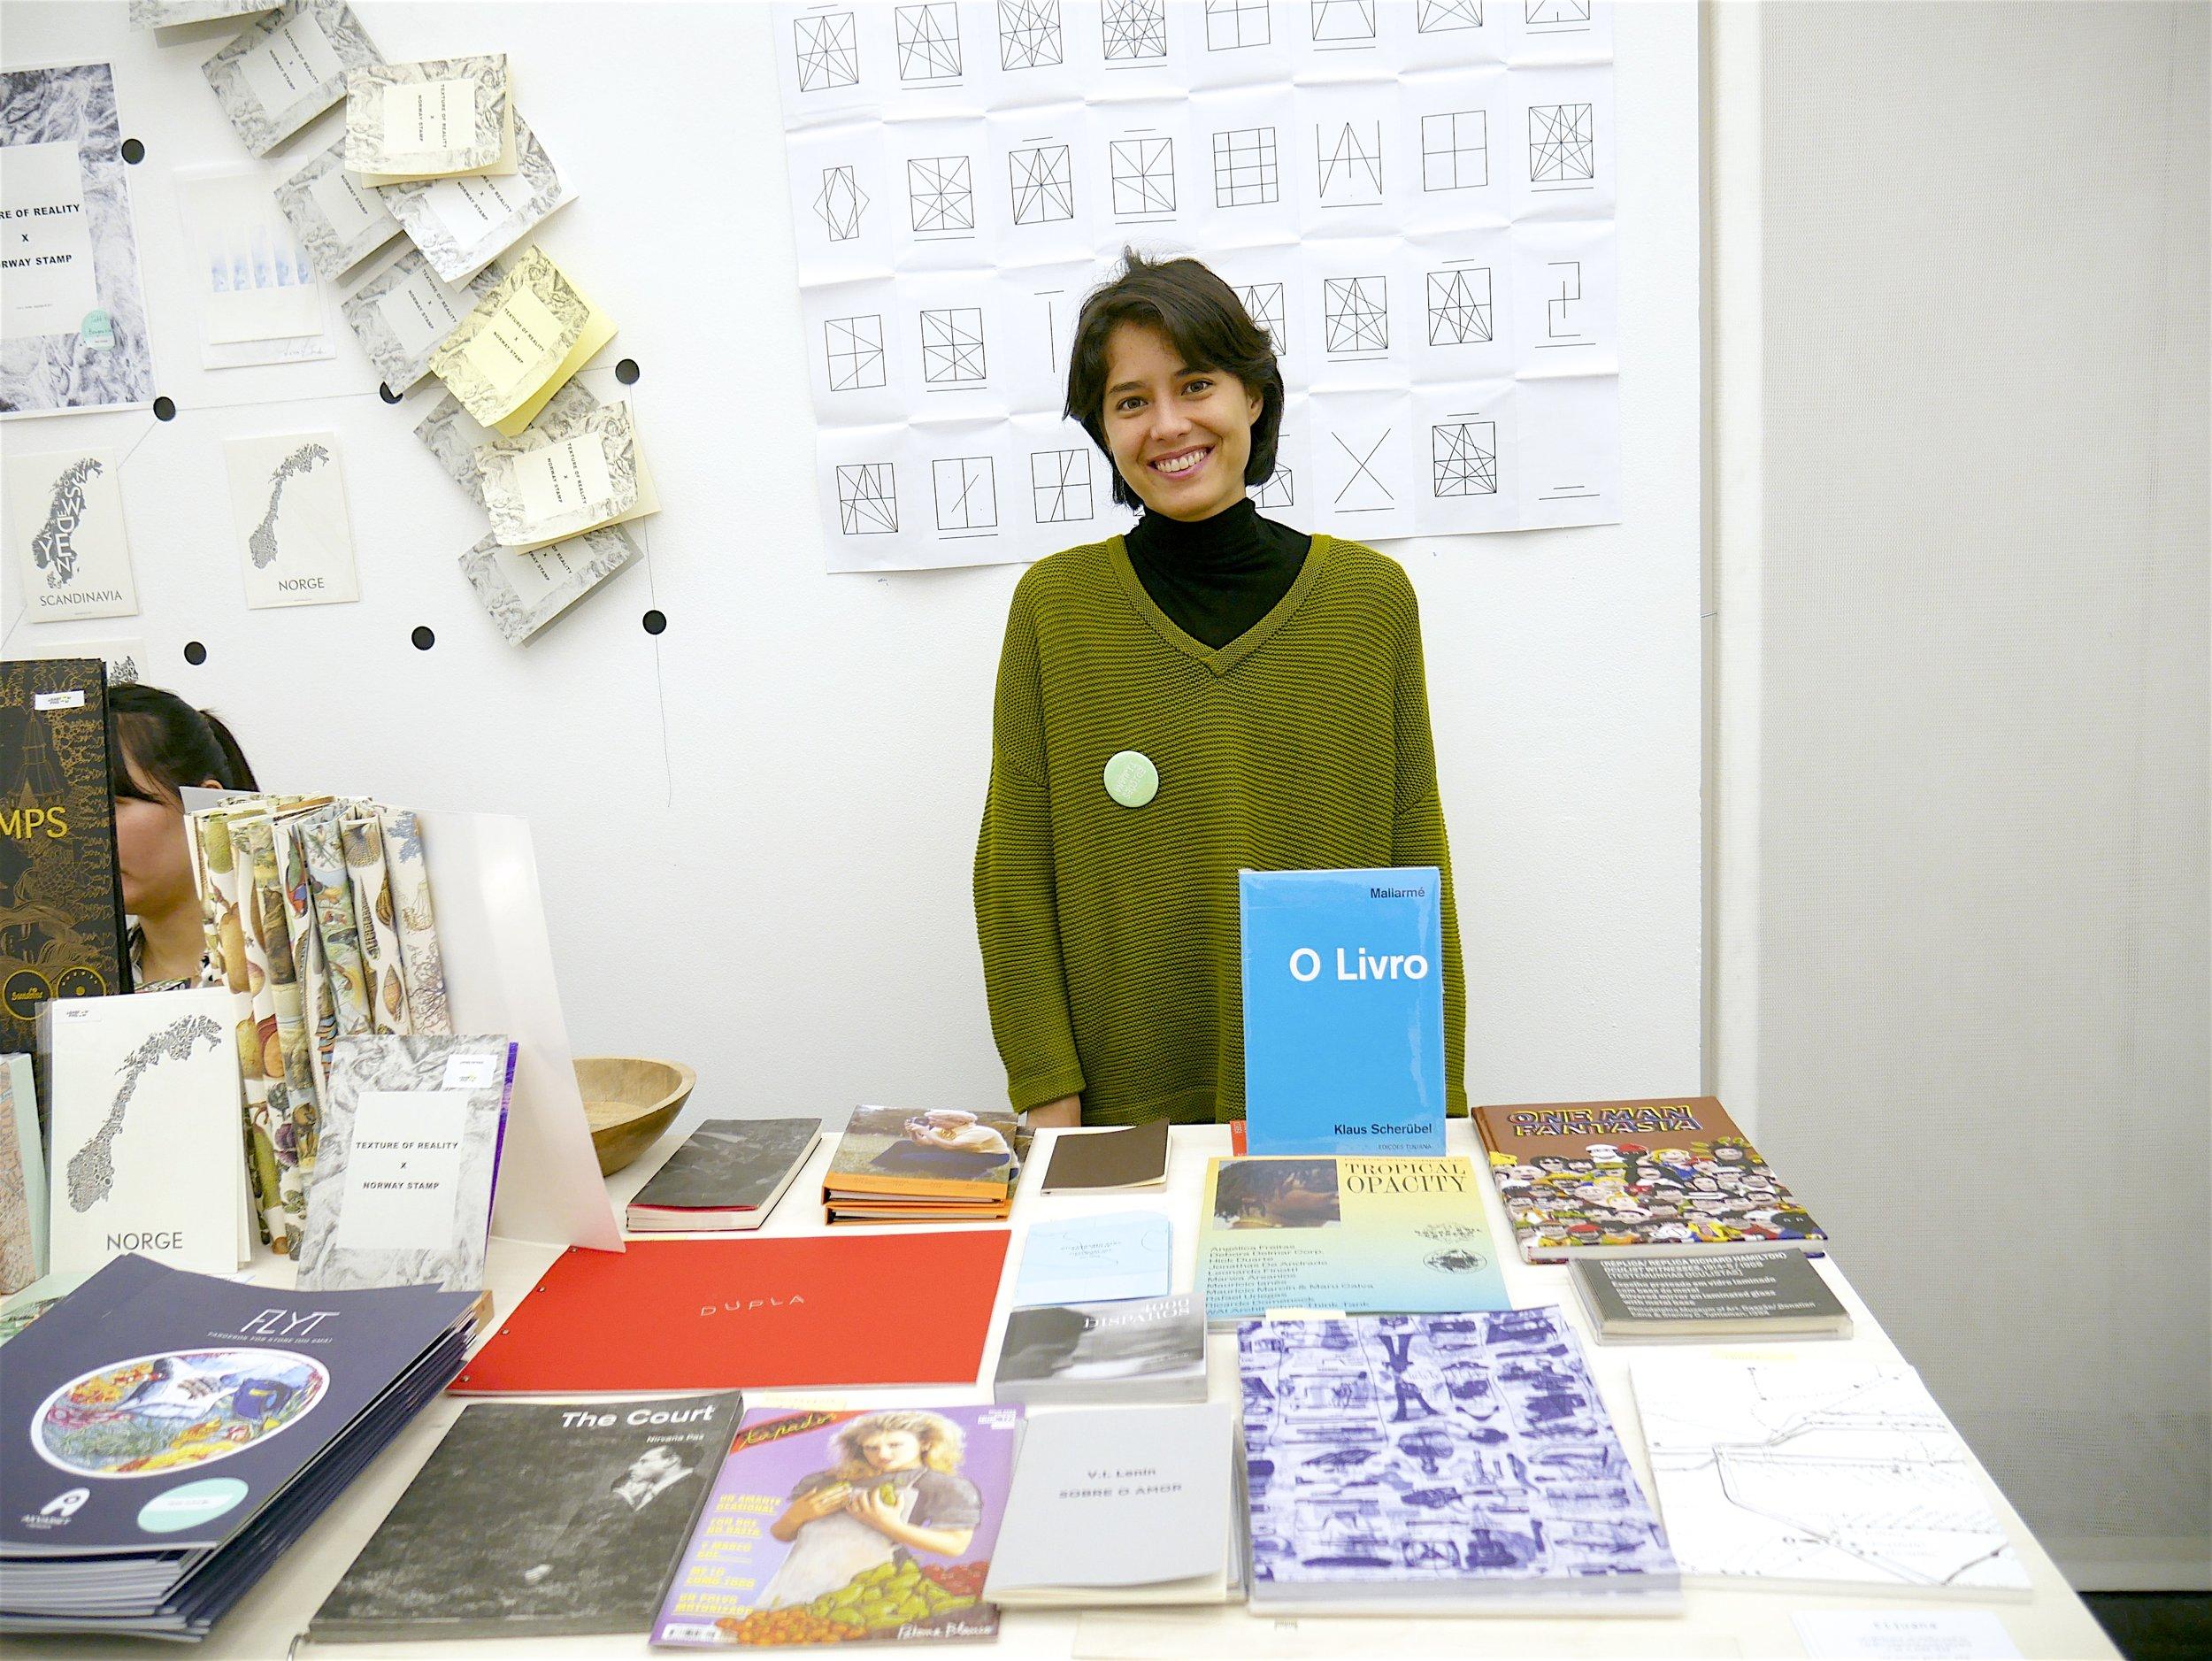 Maite Claveau from Edições Tijuana (São Paulo, Brazil)